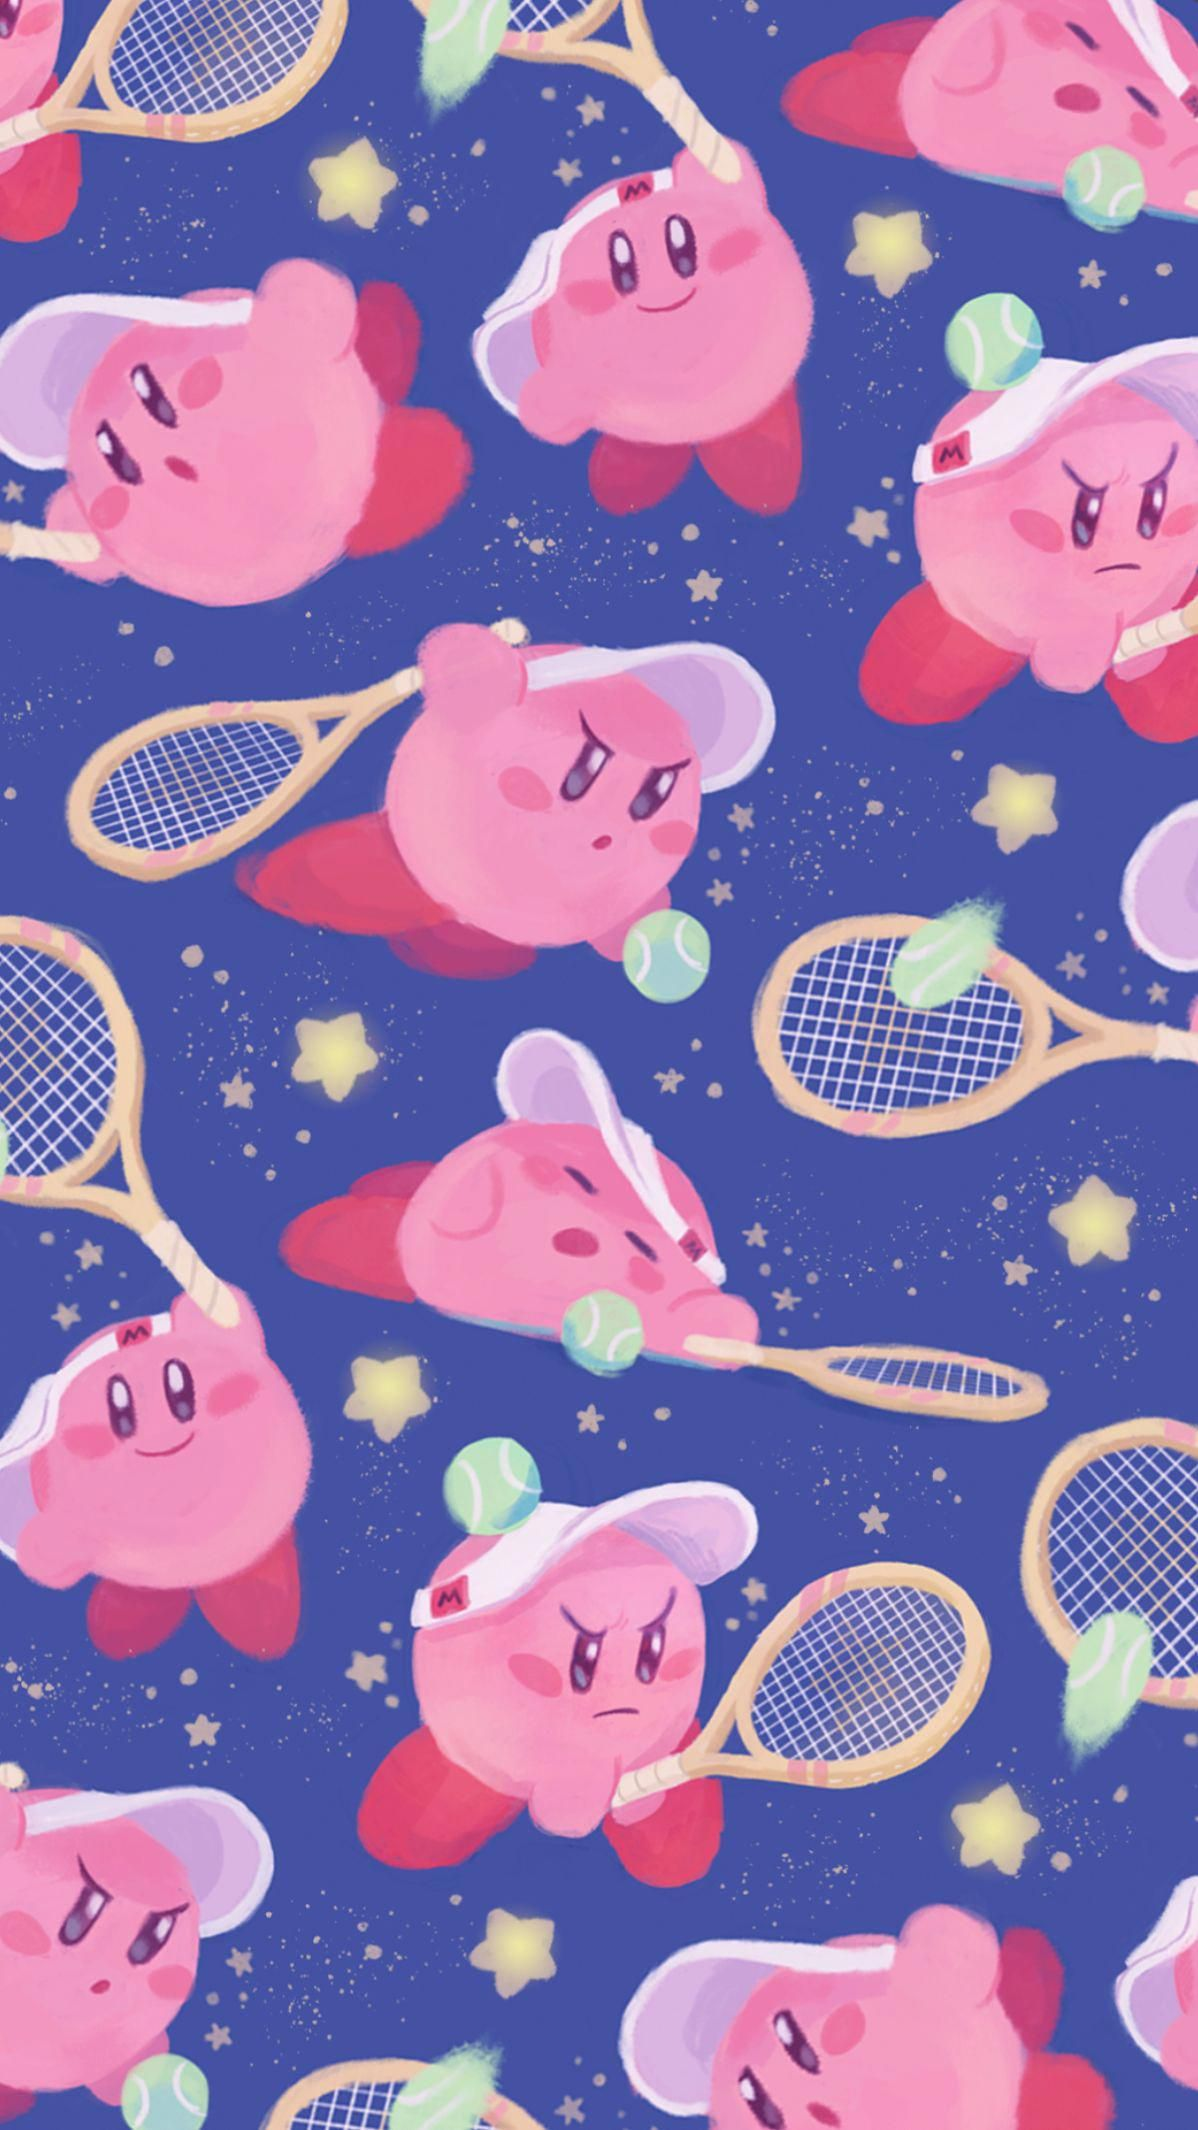 fossilarm Nintendoswitch Kirby art, Kirby character